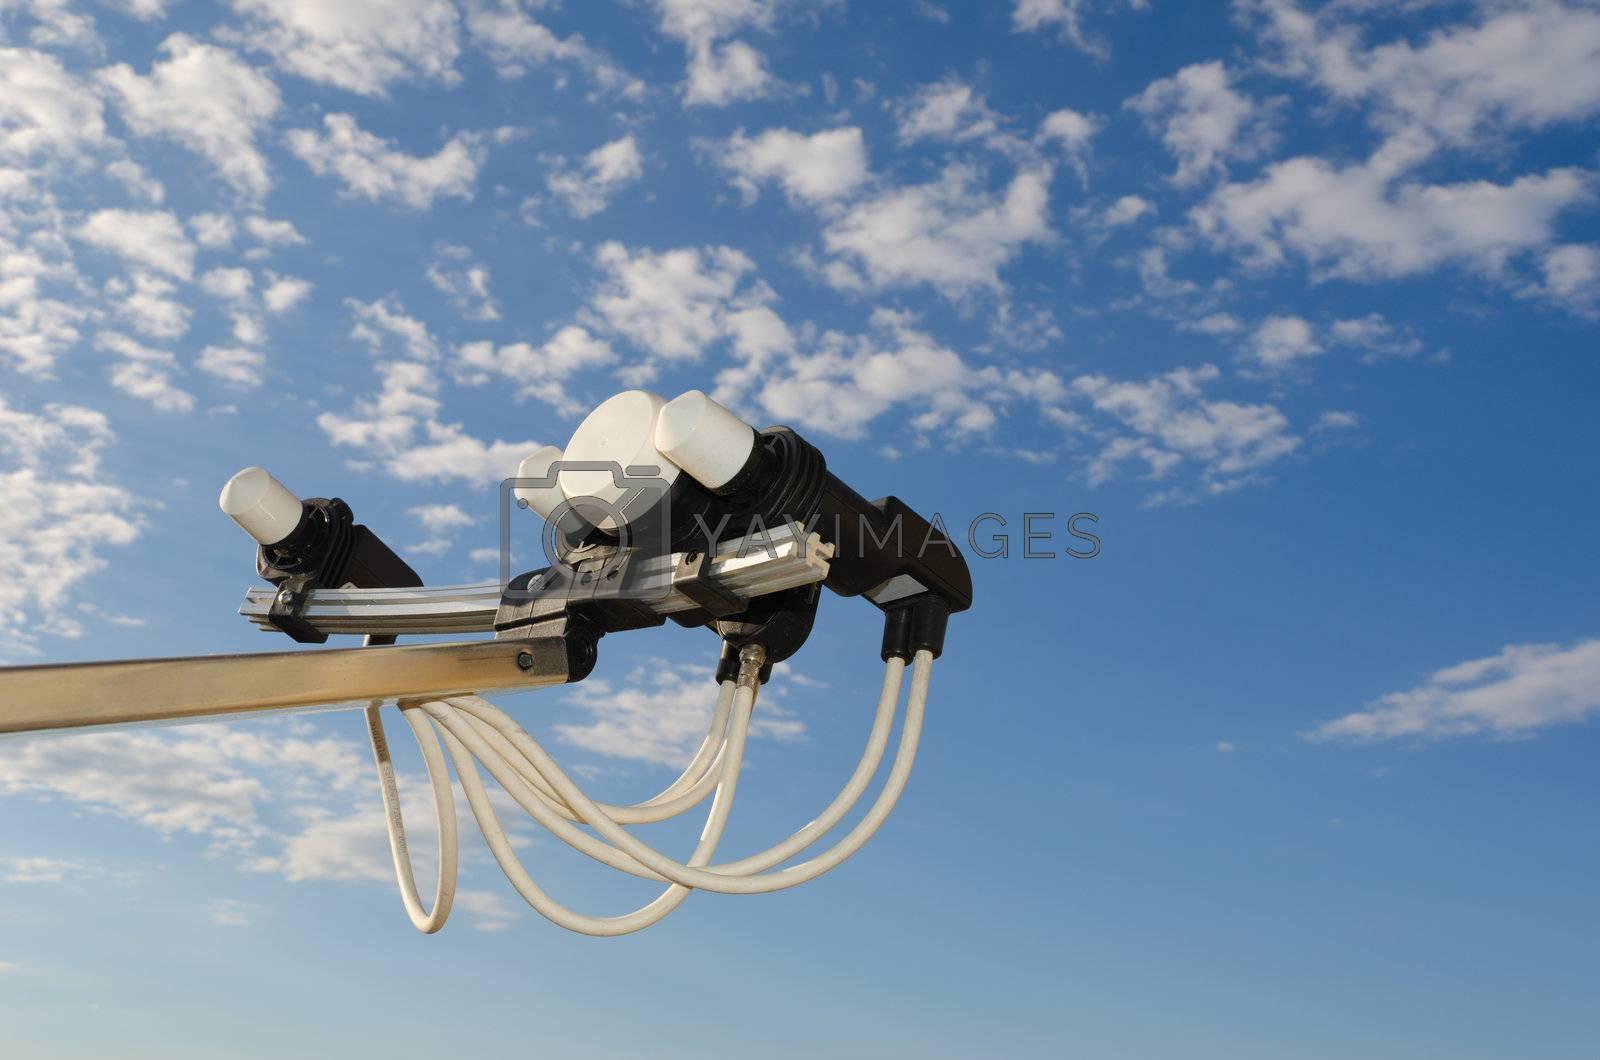 antenna transponders faced towards sky